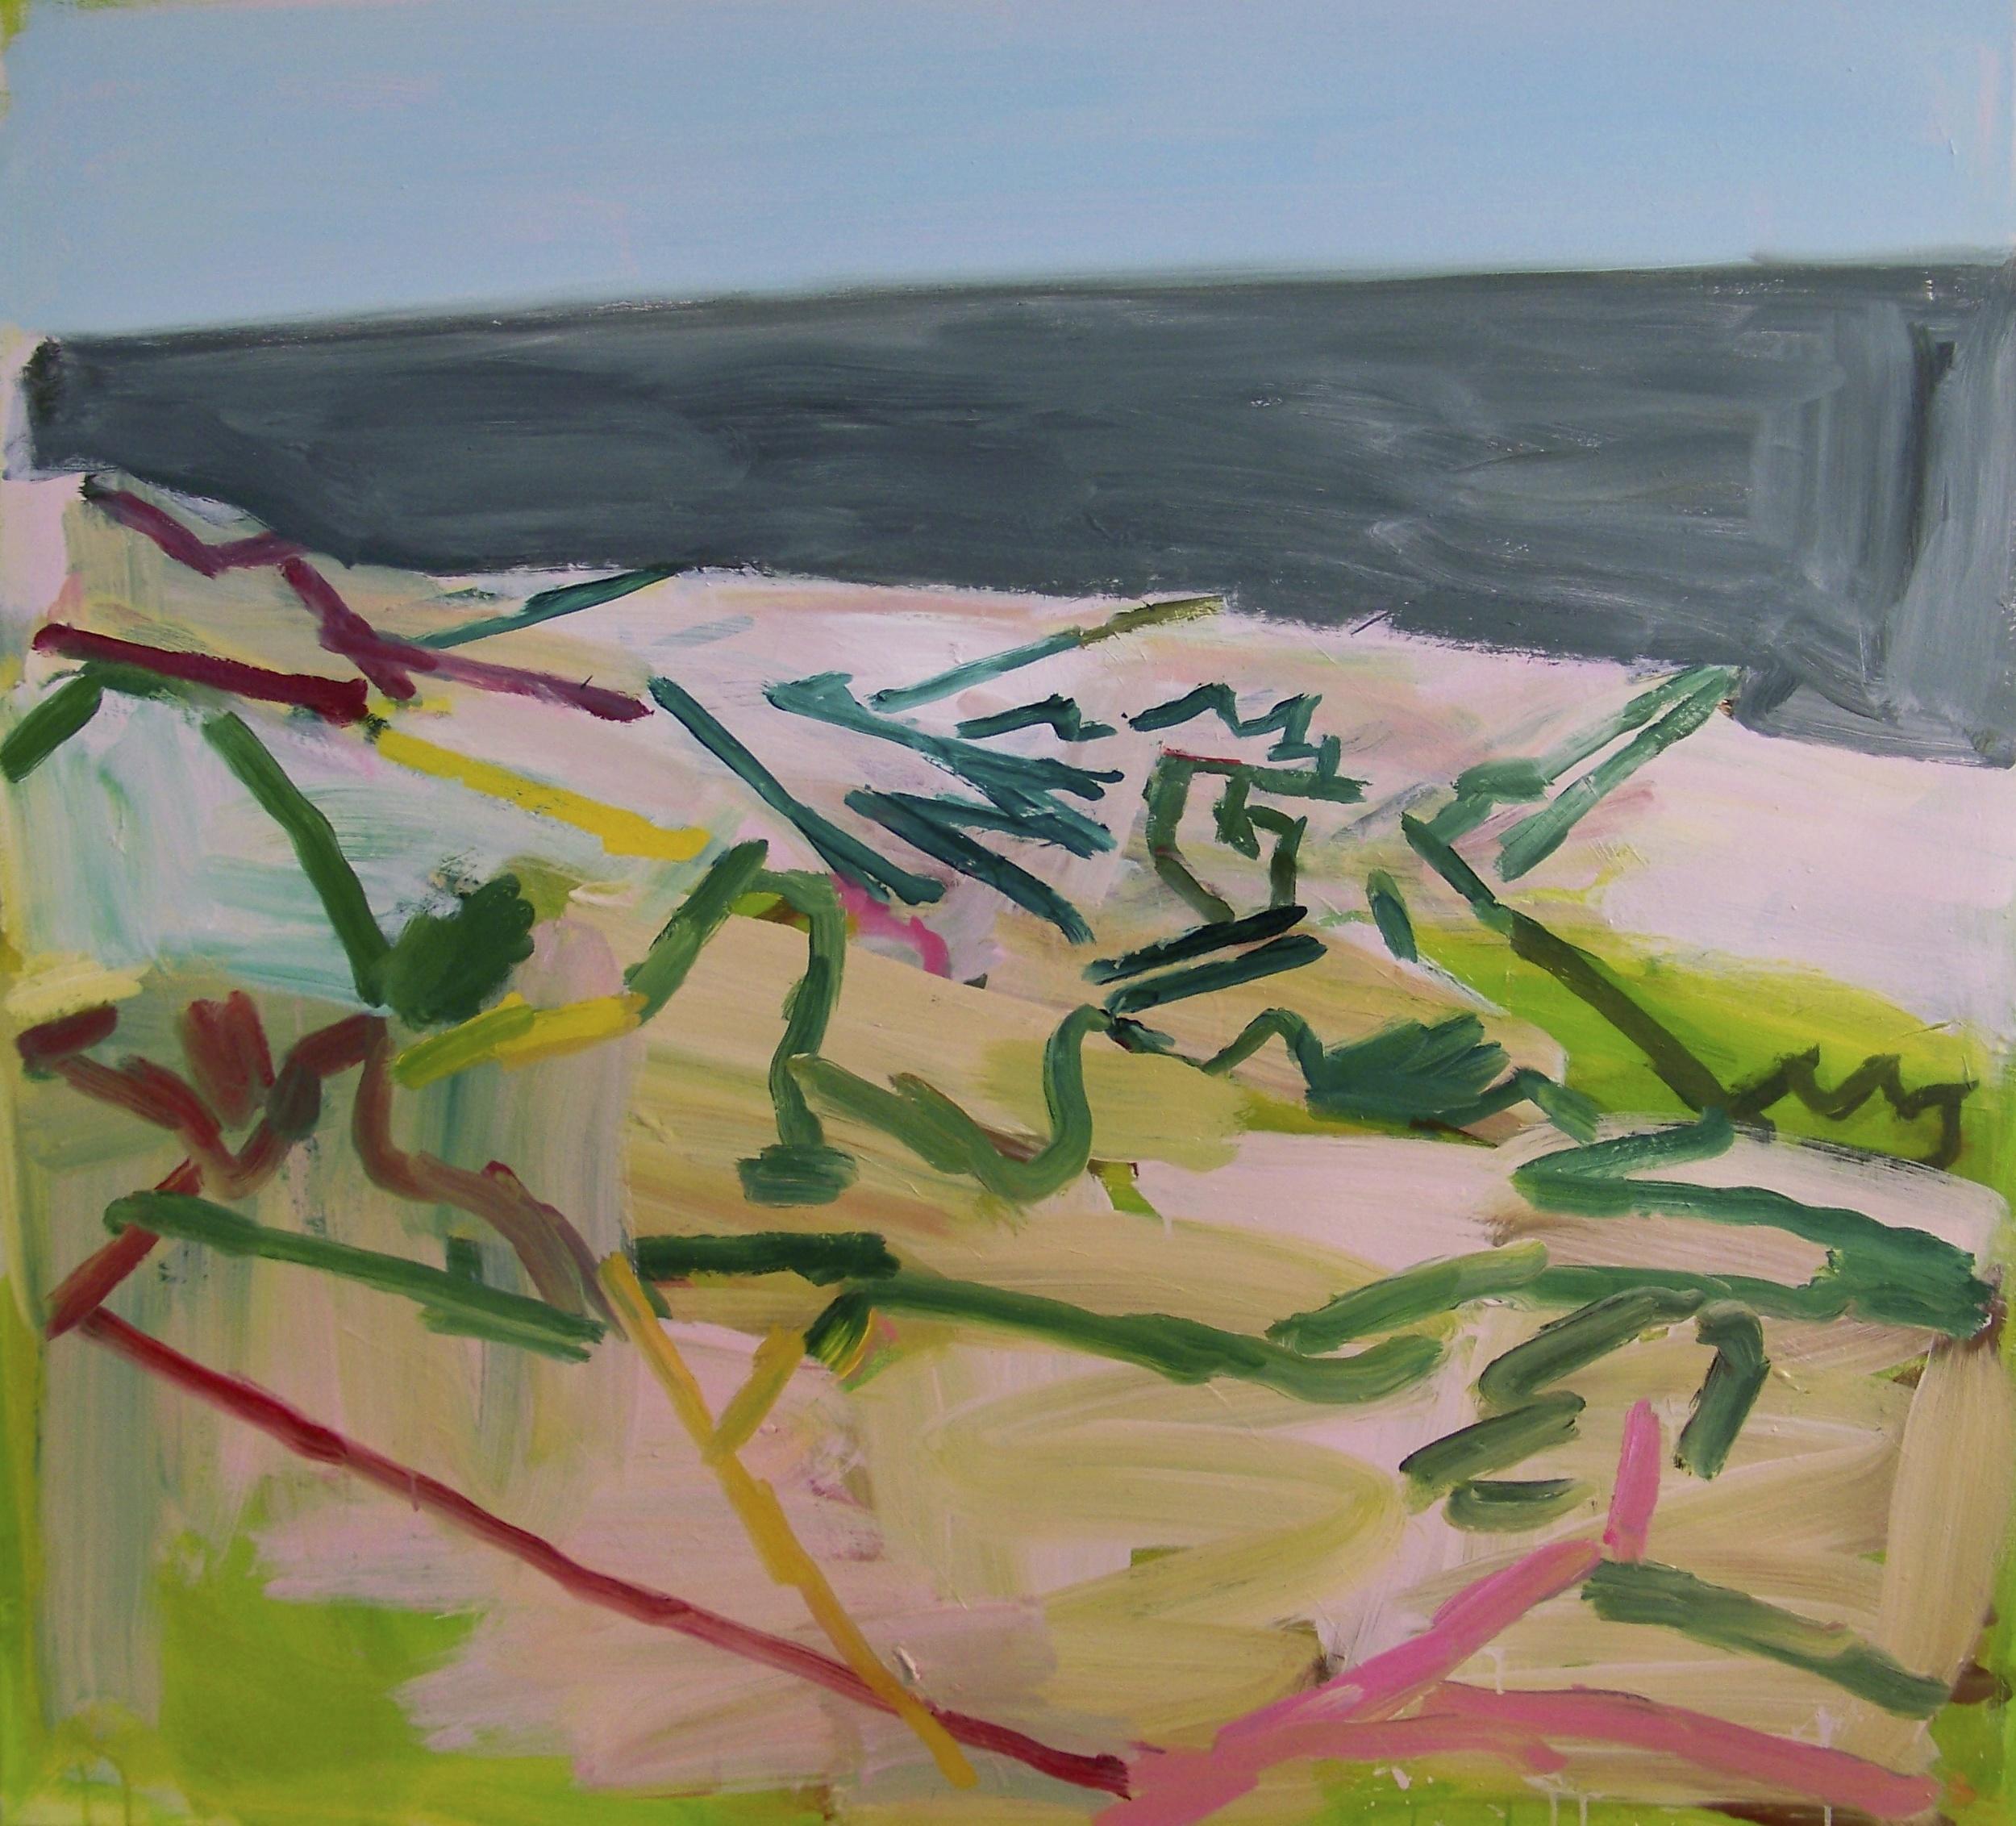 Sandy Hook and Dark Sea, 2013